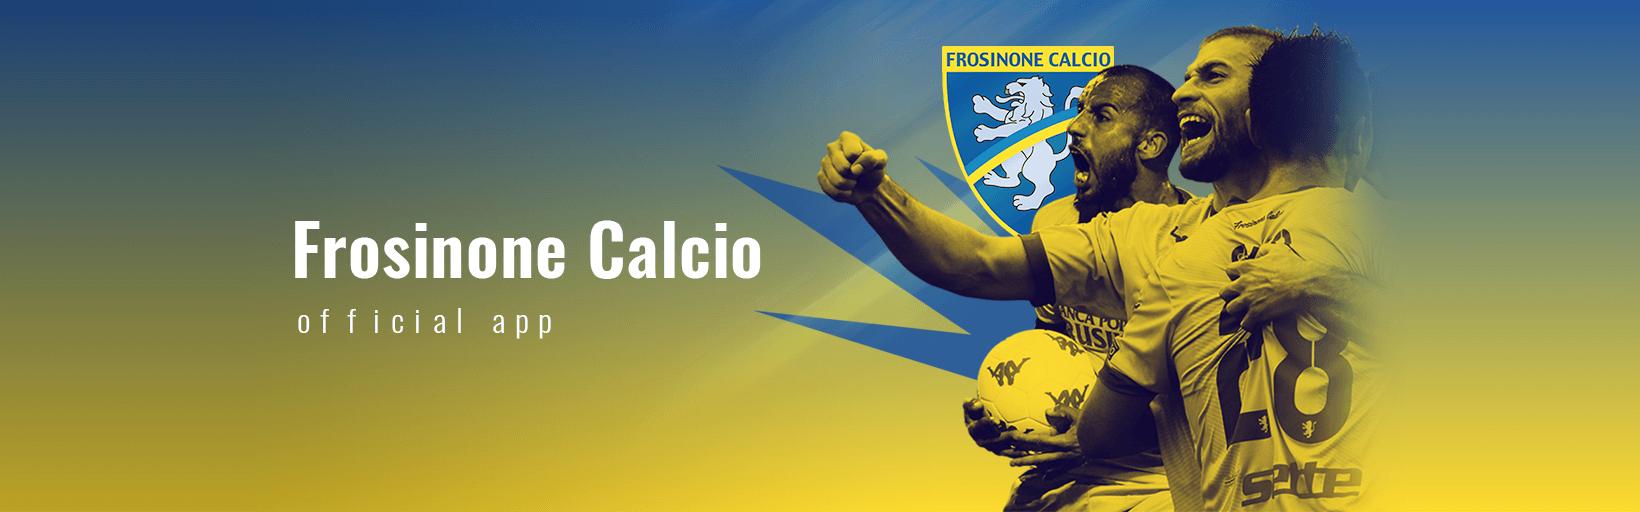 Frosinone Calcio Sport Platform